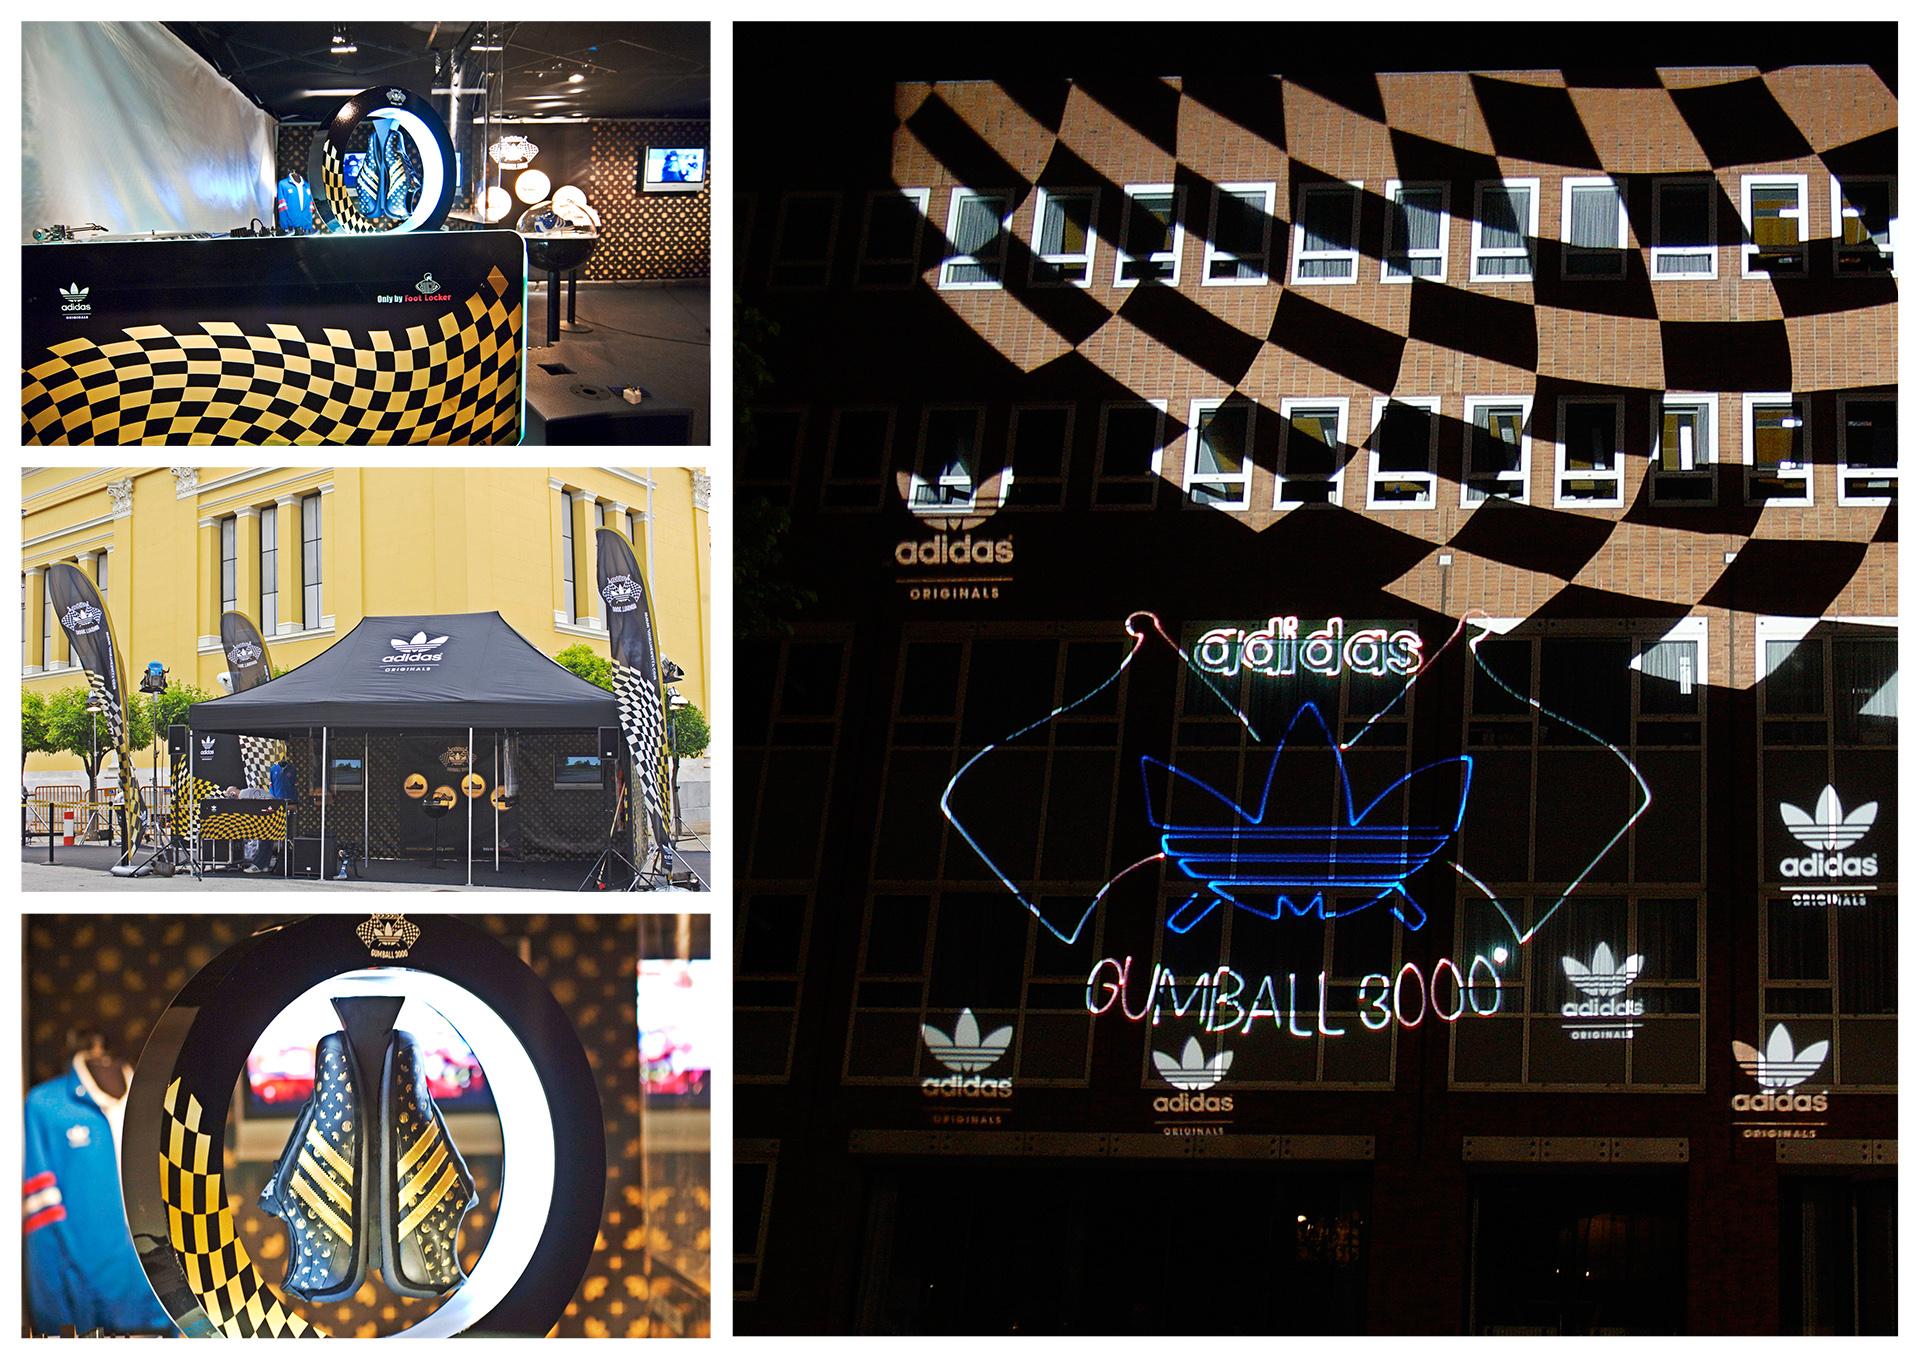 adidas, laserprojektion, lasershow, lasergrafiken, zelt, aufbau, promotion, schuhe,gumball 3000 streetrace,straßenrennen,project a, christopher baer,bochum,europatour,schudisplay, schuhpräsentation, schwebende schuhe